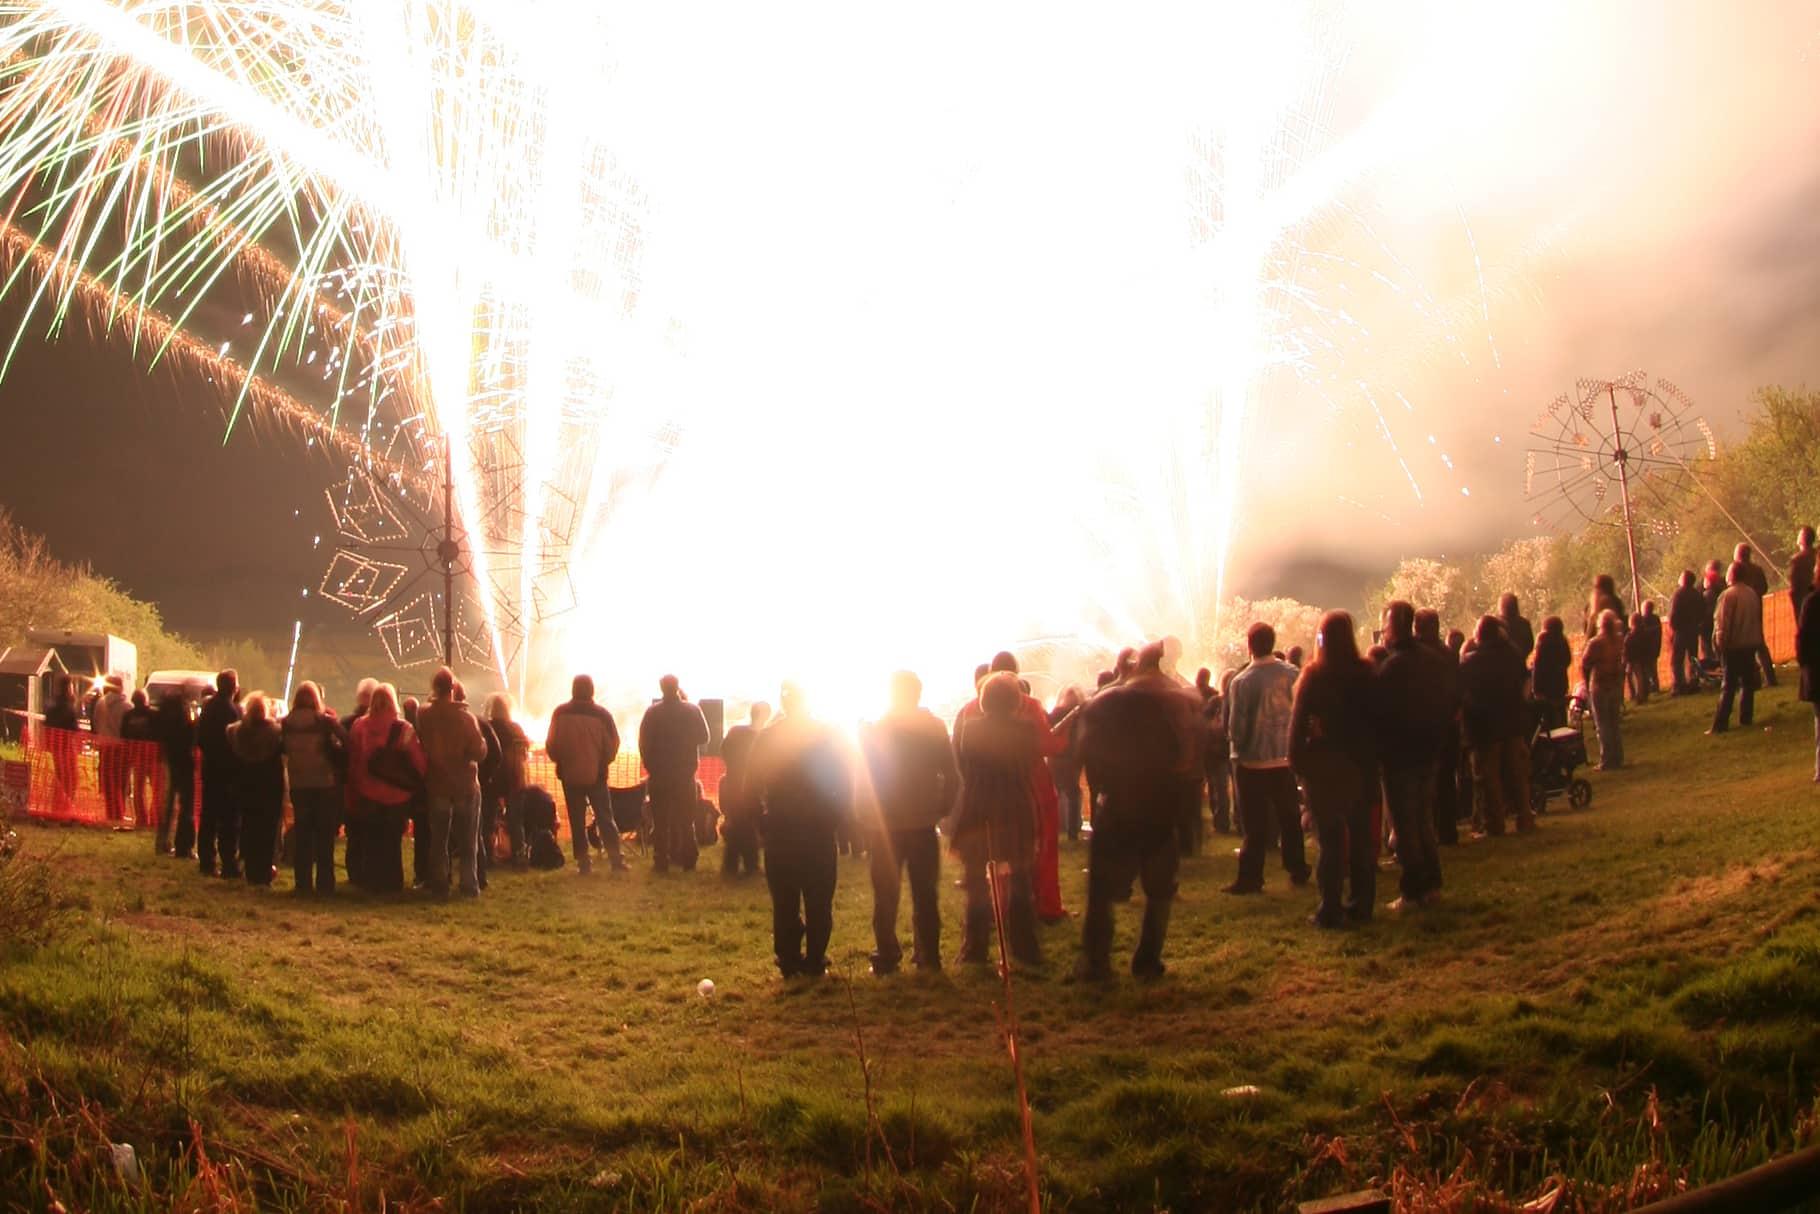 Intense Fireworks